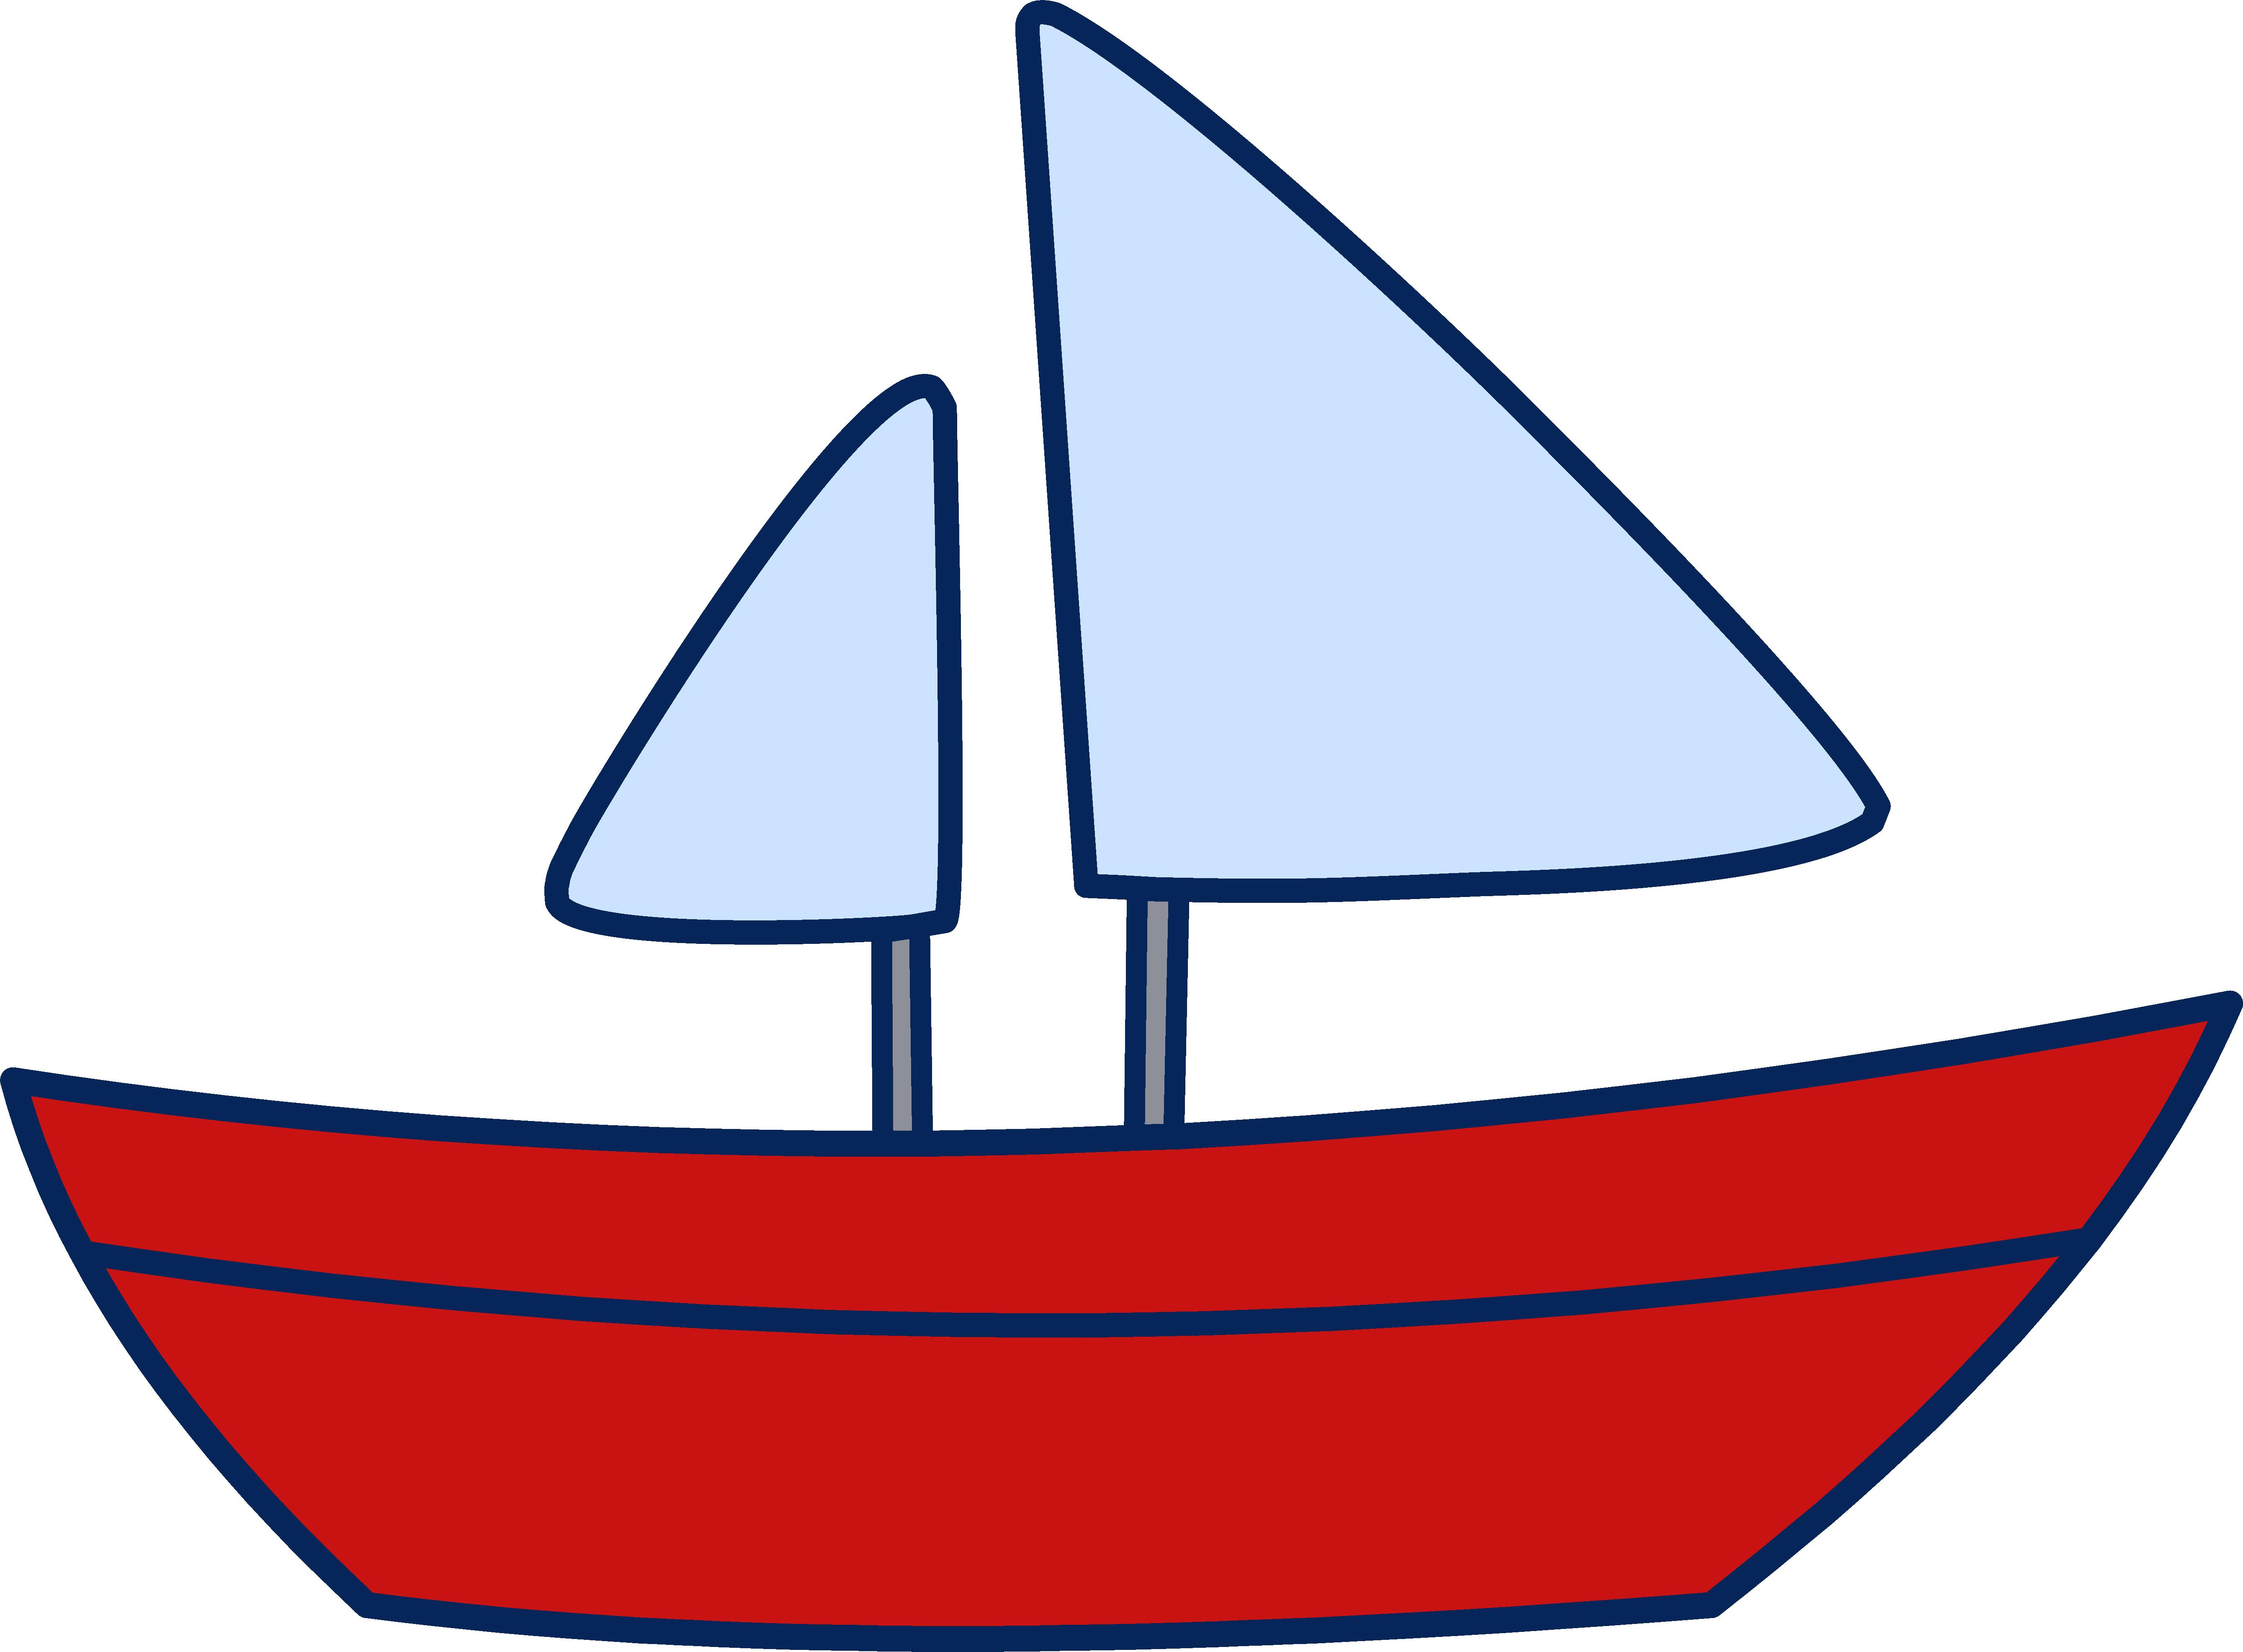 5357x3945 Simple Sailboat Drawing Clipart Panda